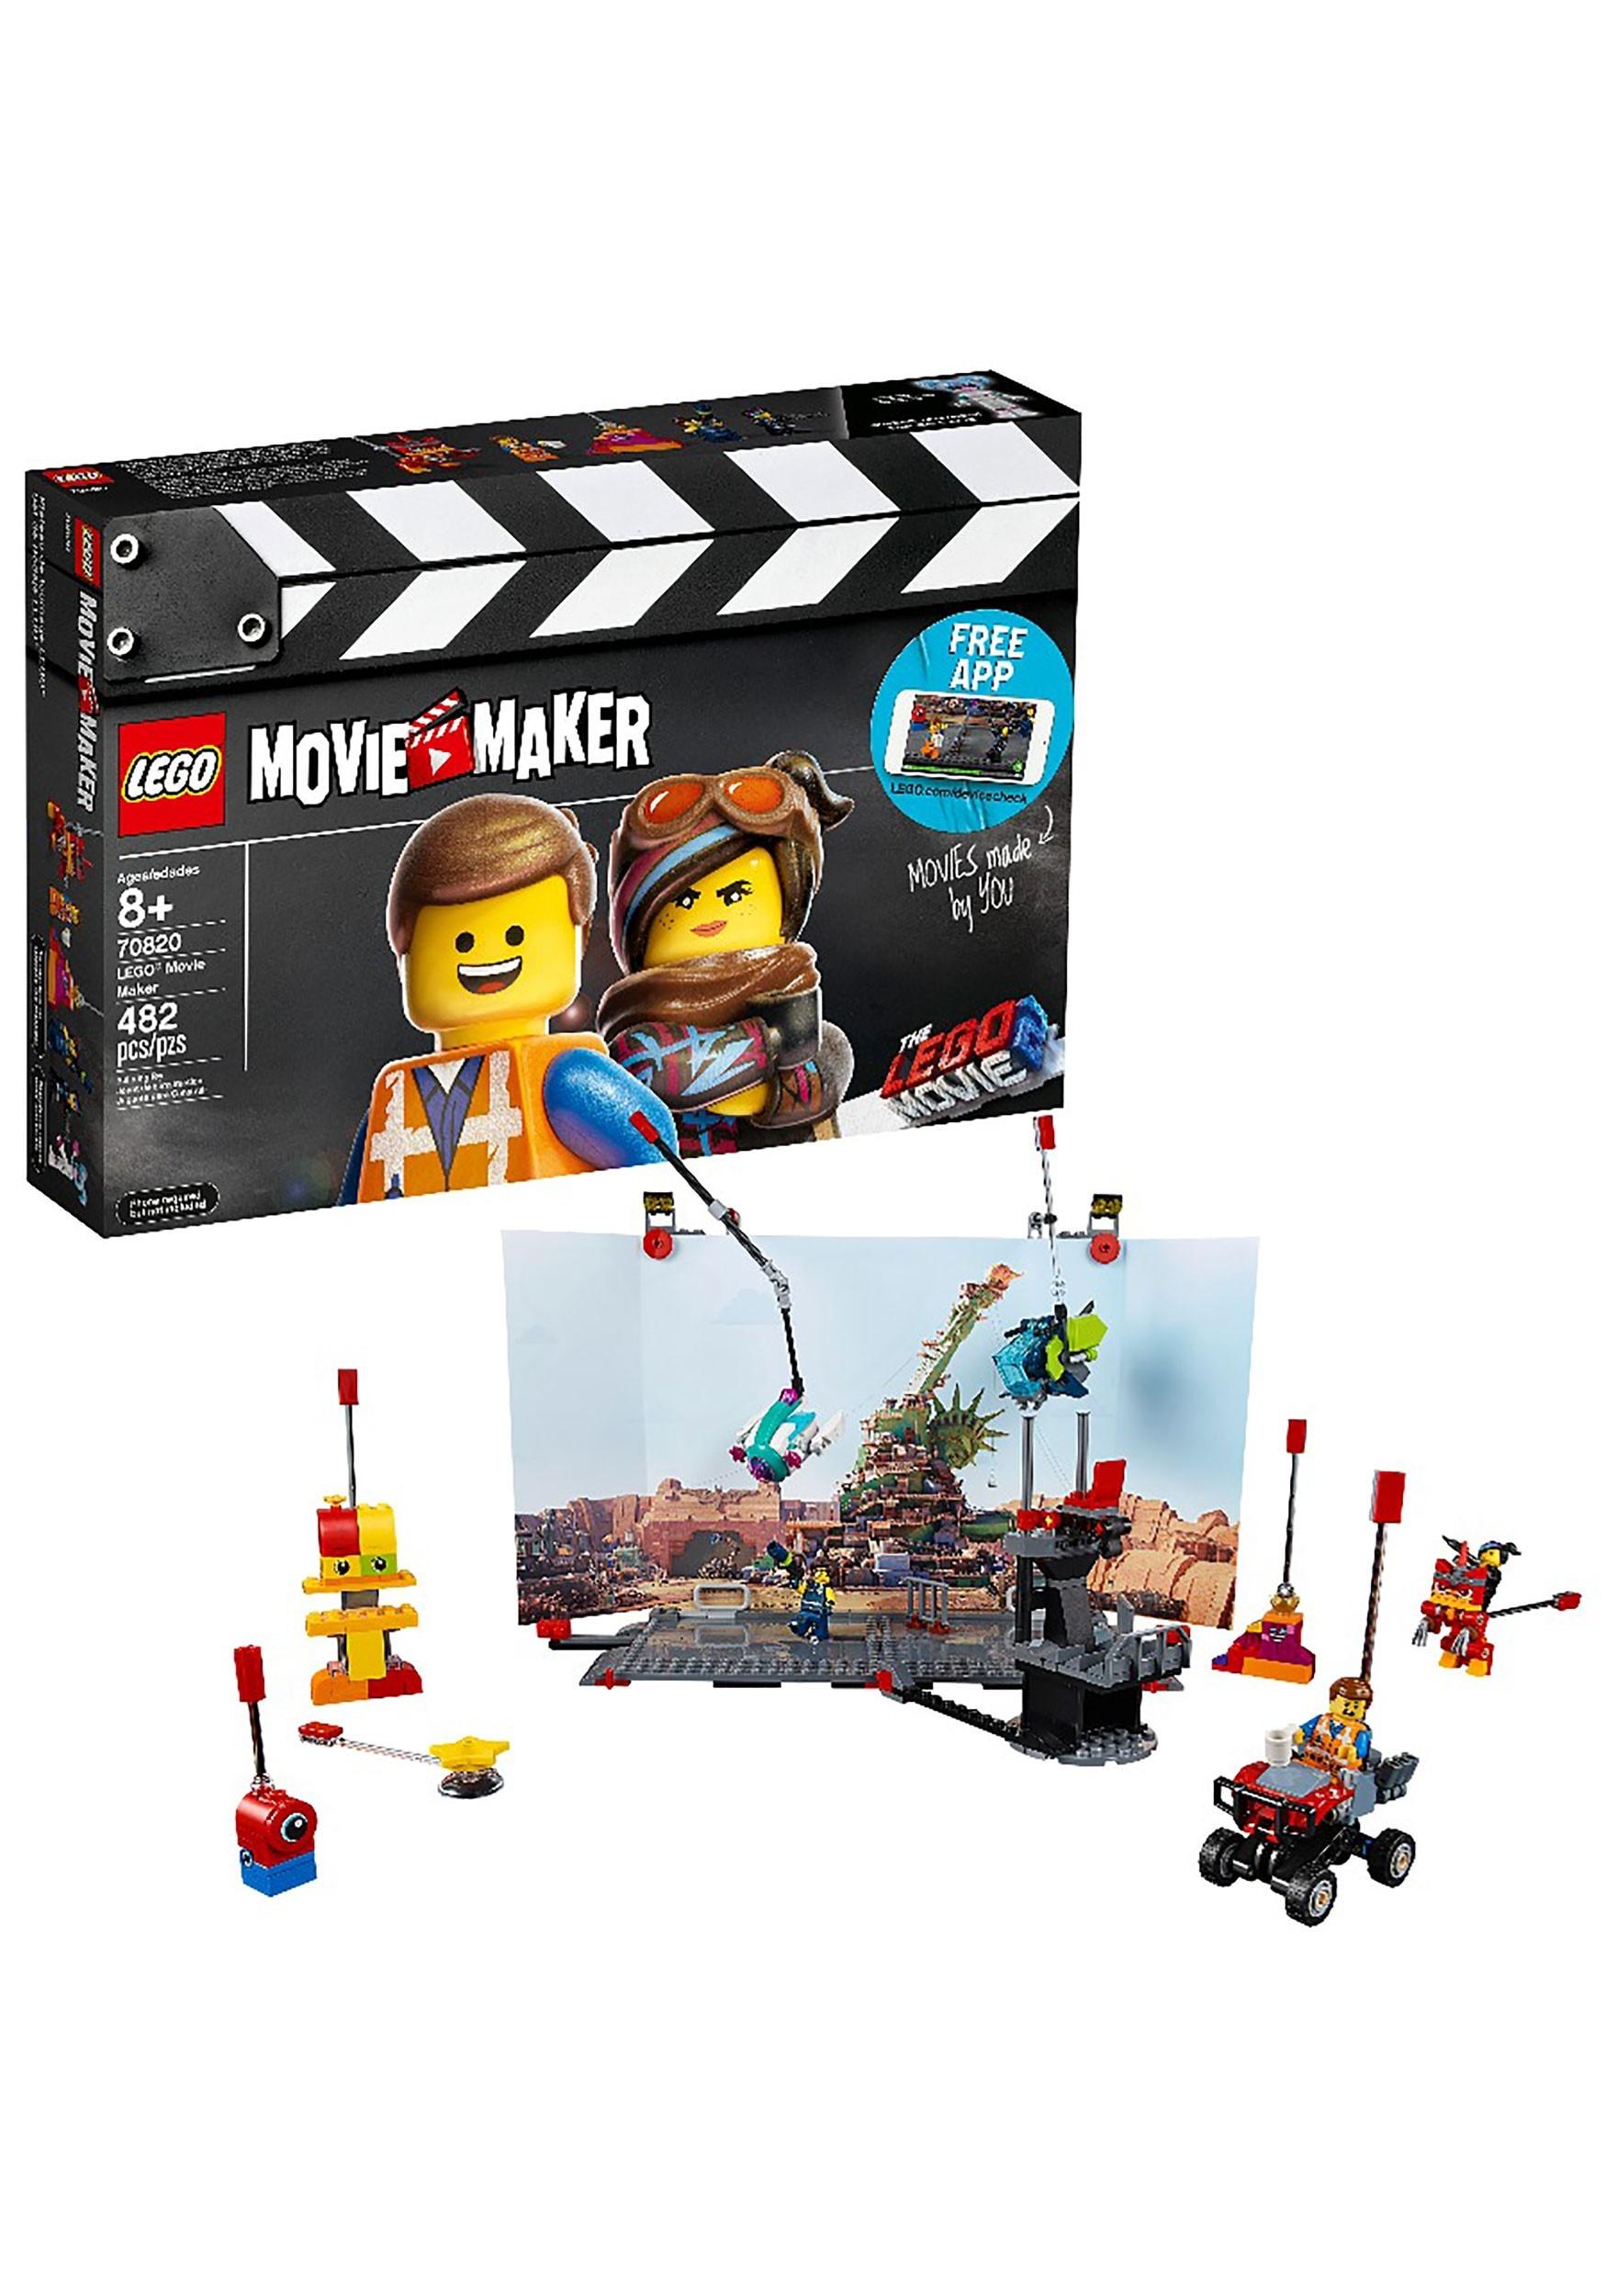 LEGO Movie 2 Movie Maker Kit